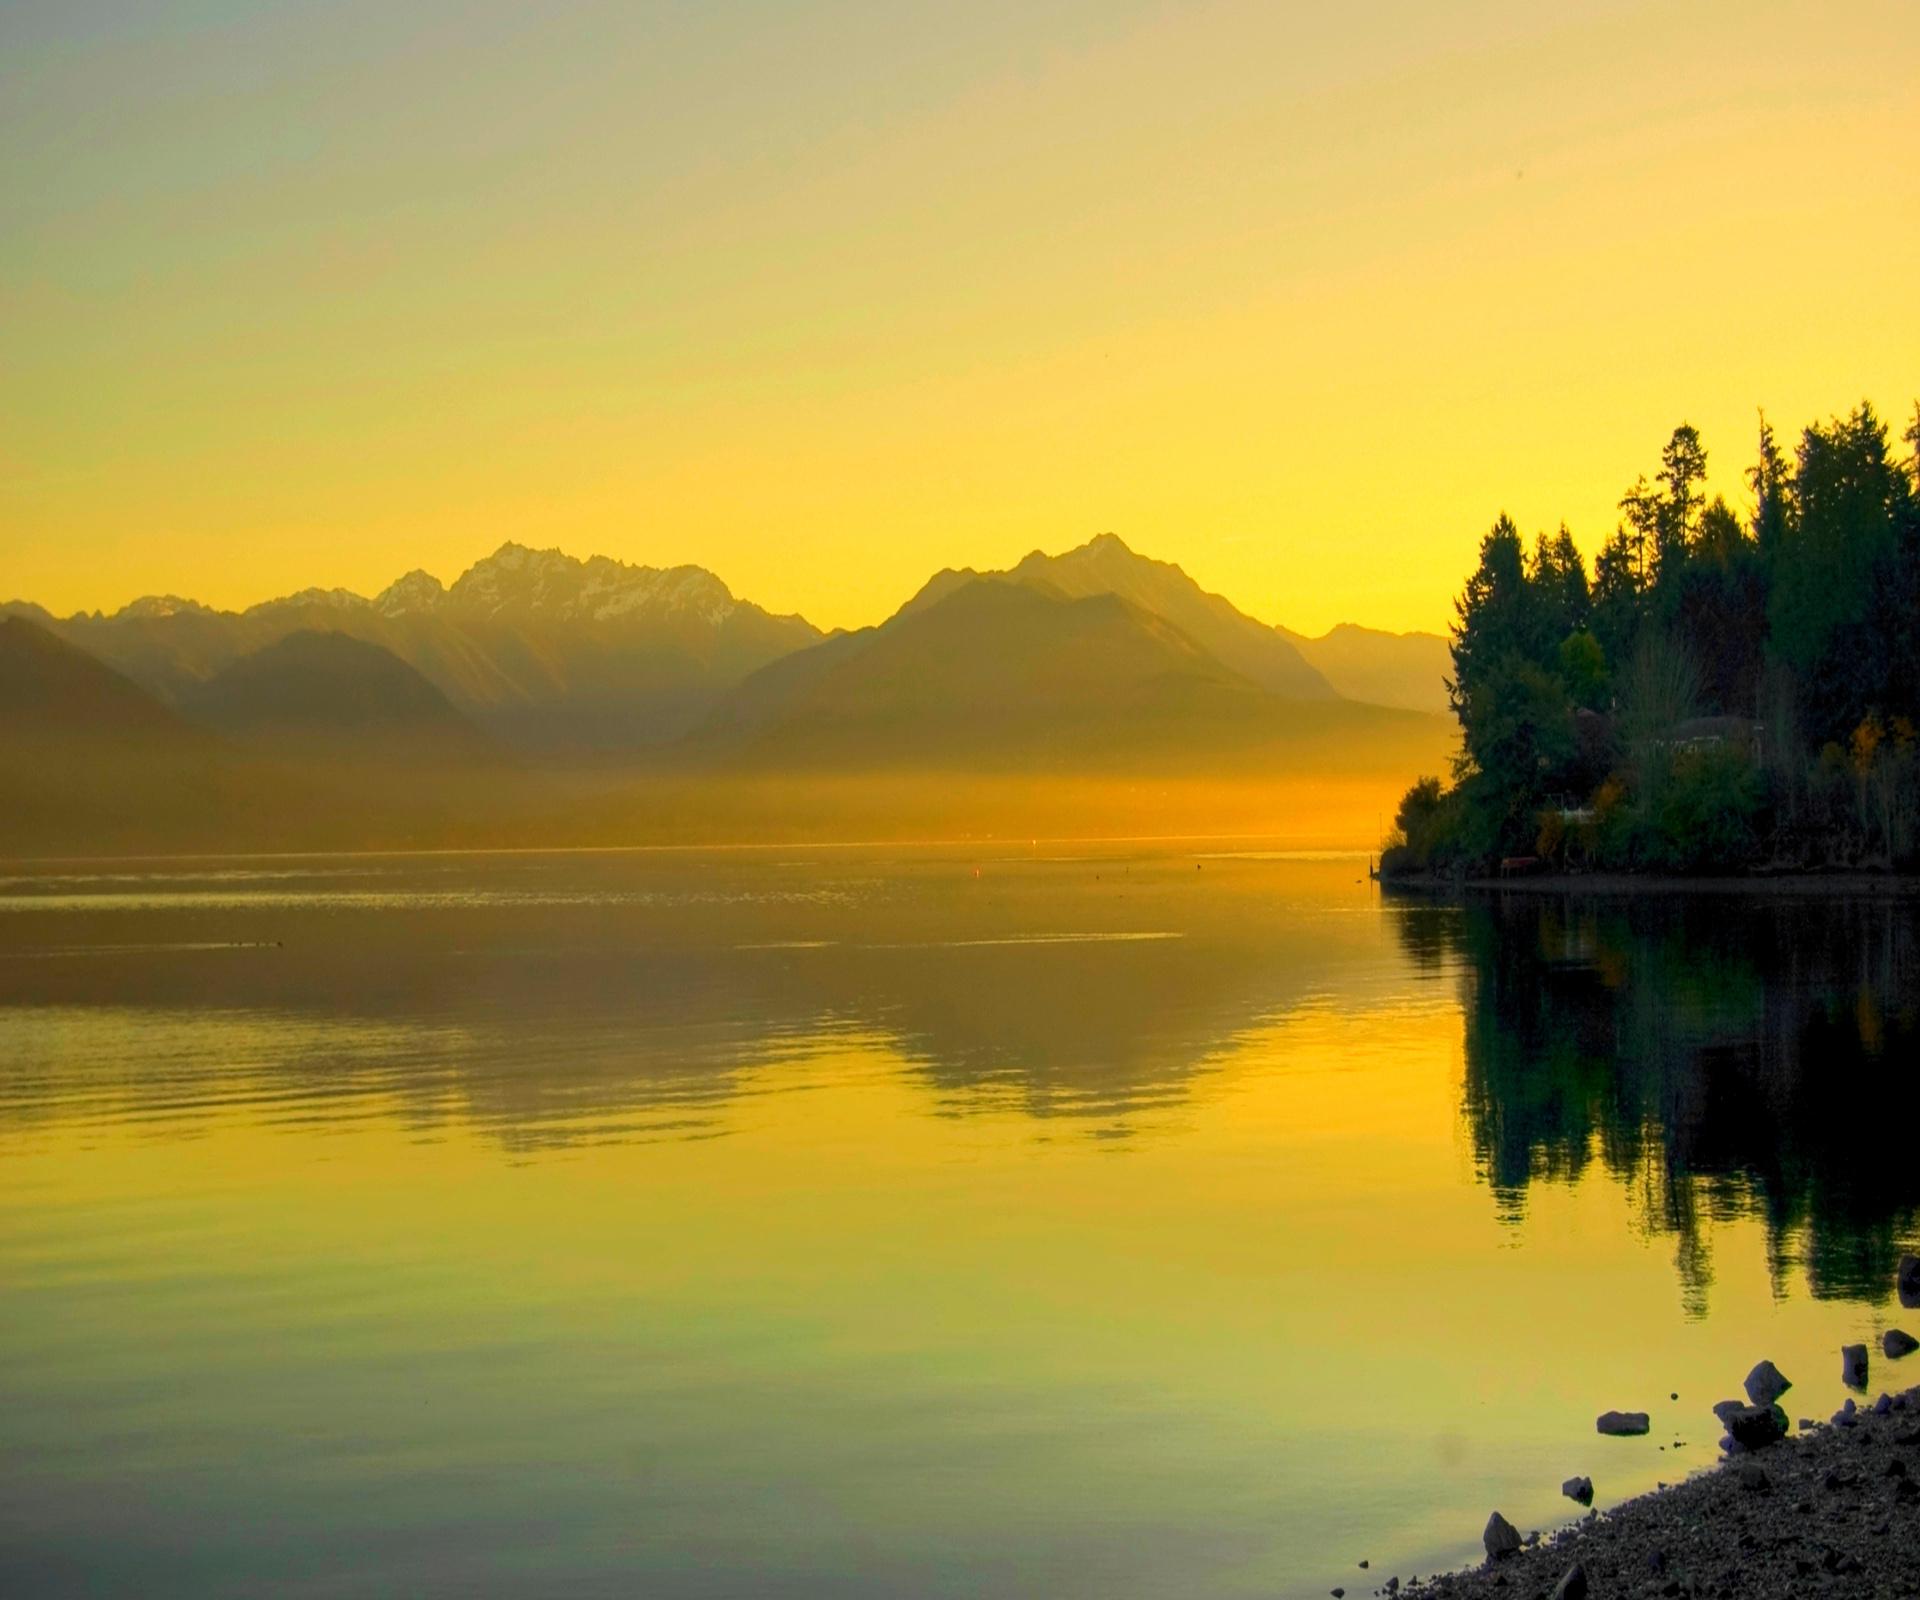 Wallpapersafari: Good Morning Beautiful Wallpaper